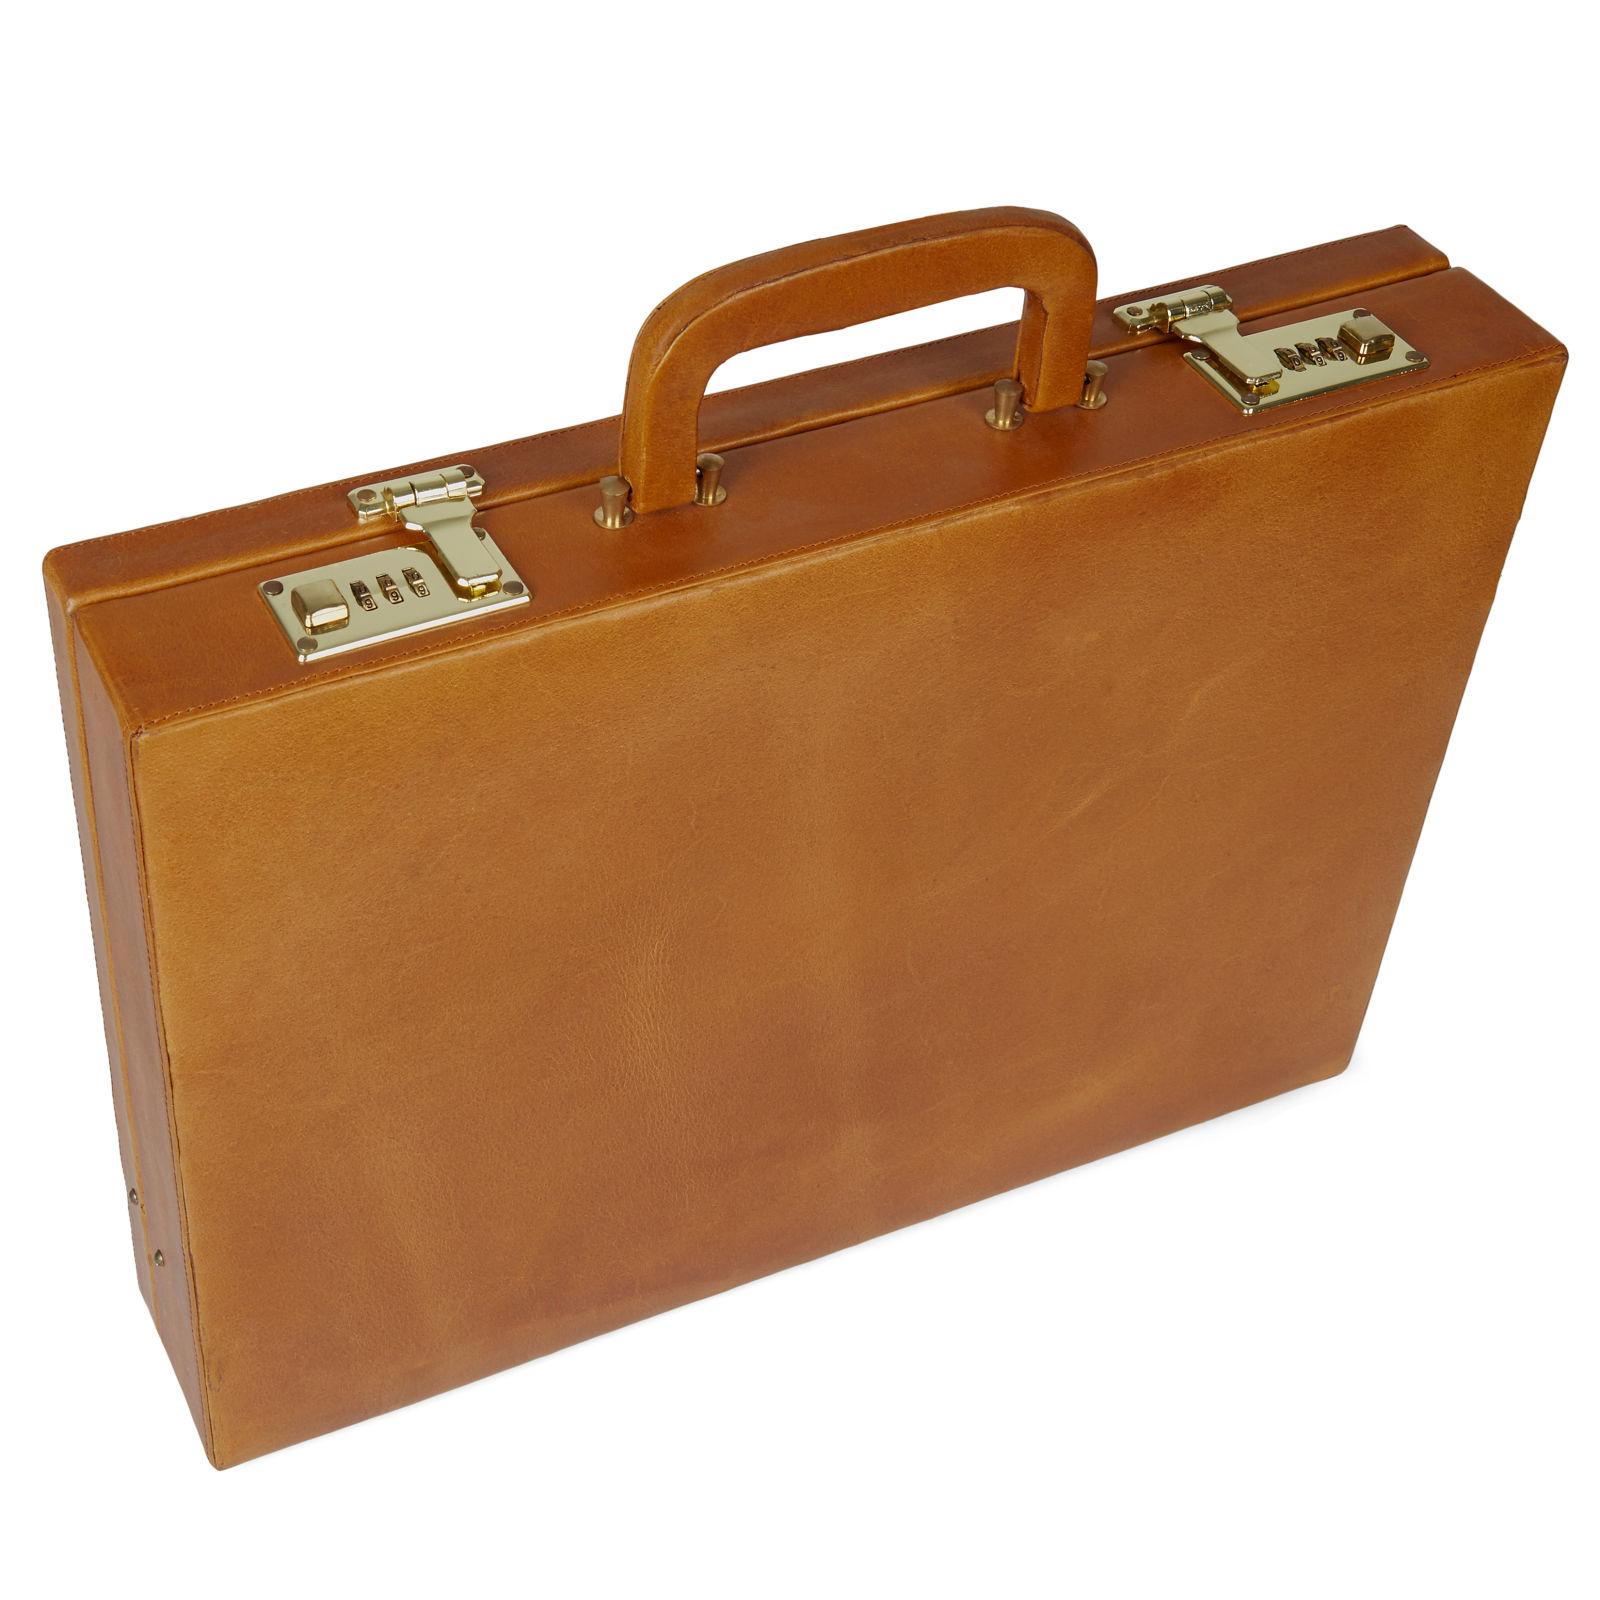 Porte-documents en cuir marron Bucko